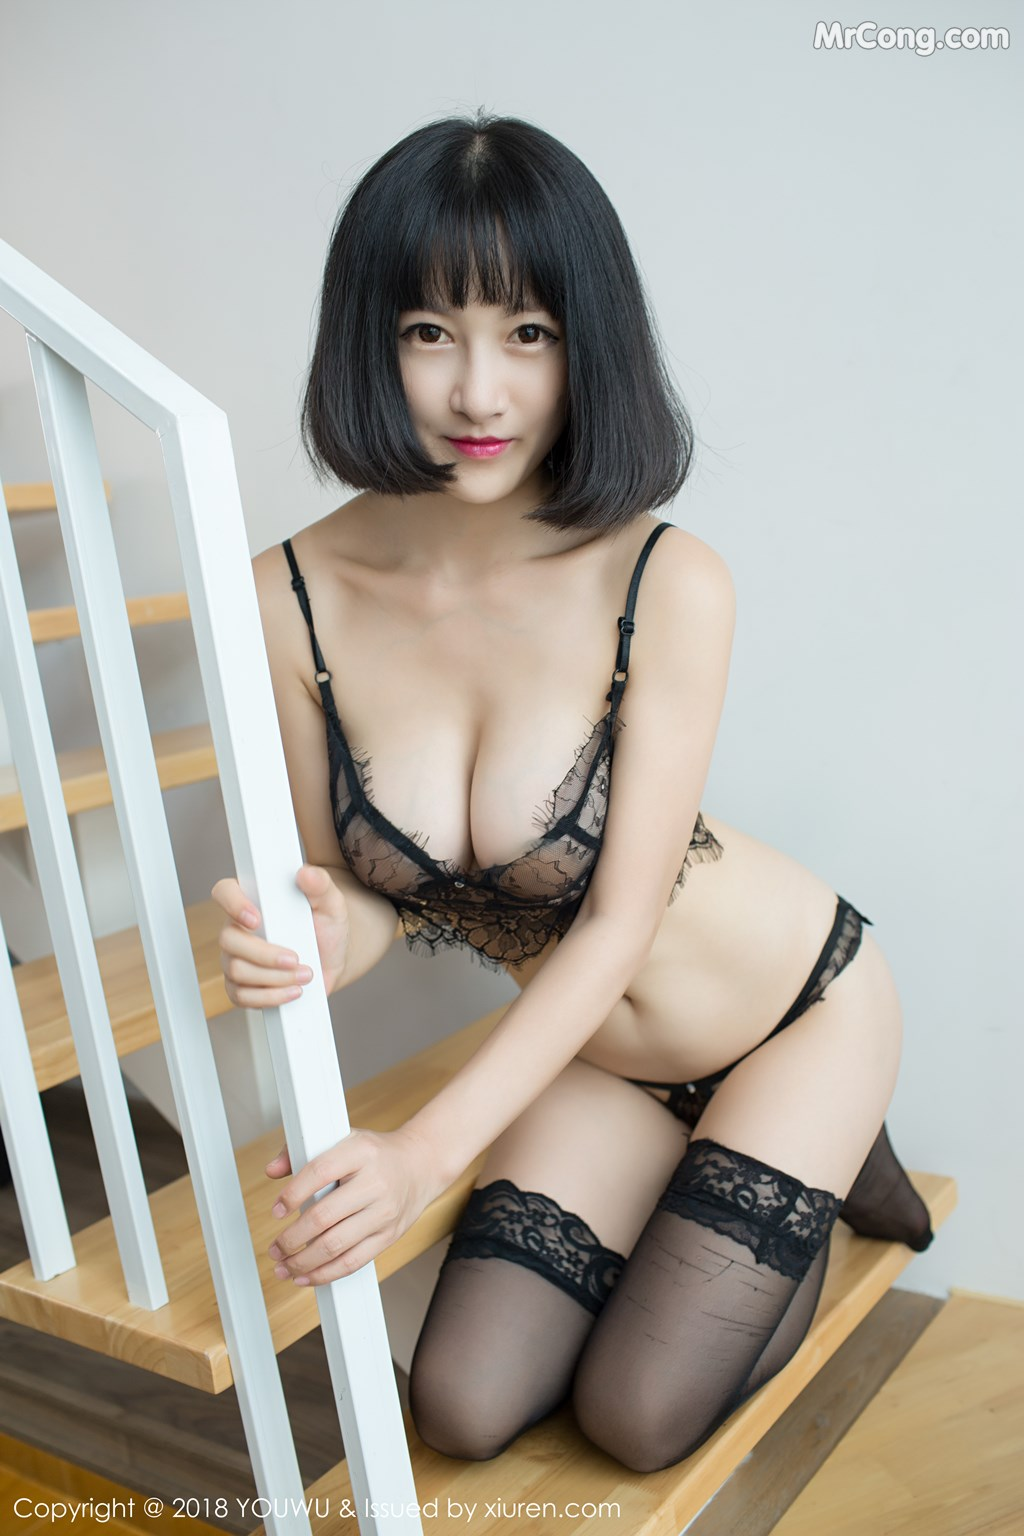 Image YouWu-Vol.114-MrCong.com-008 in post YouWu Vol.114: Người mẫu Xiao Tan Ge (小探戈-) (45 ảnh)